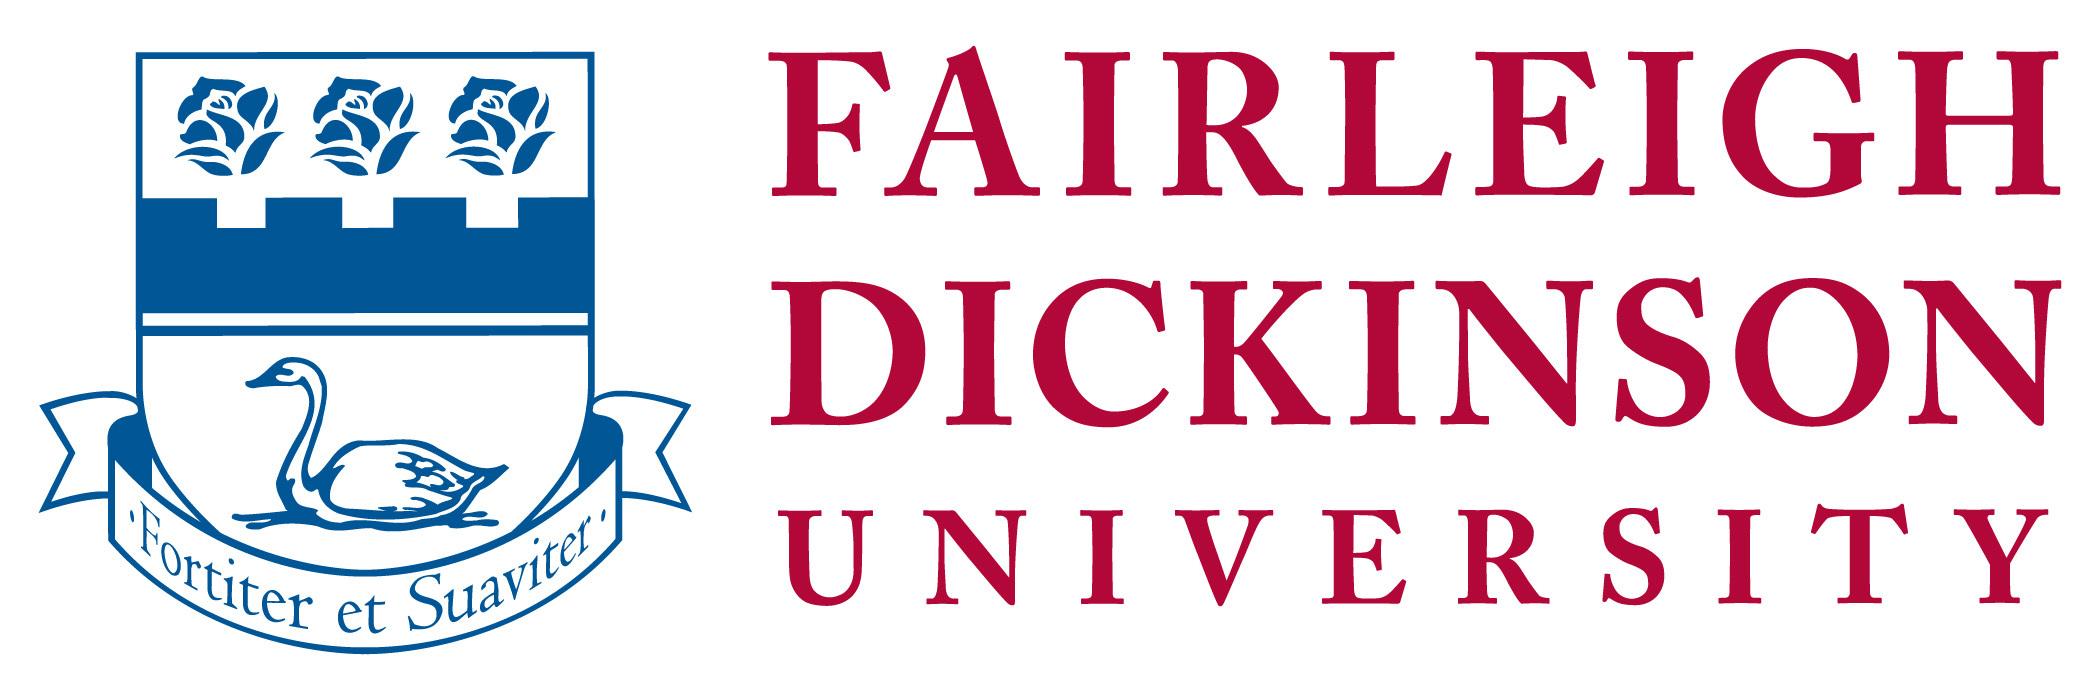 Fairleigh Dickinson University (FDU)